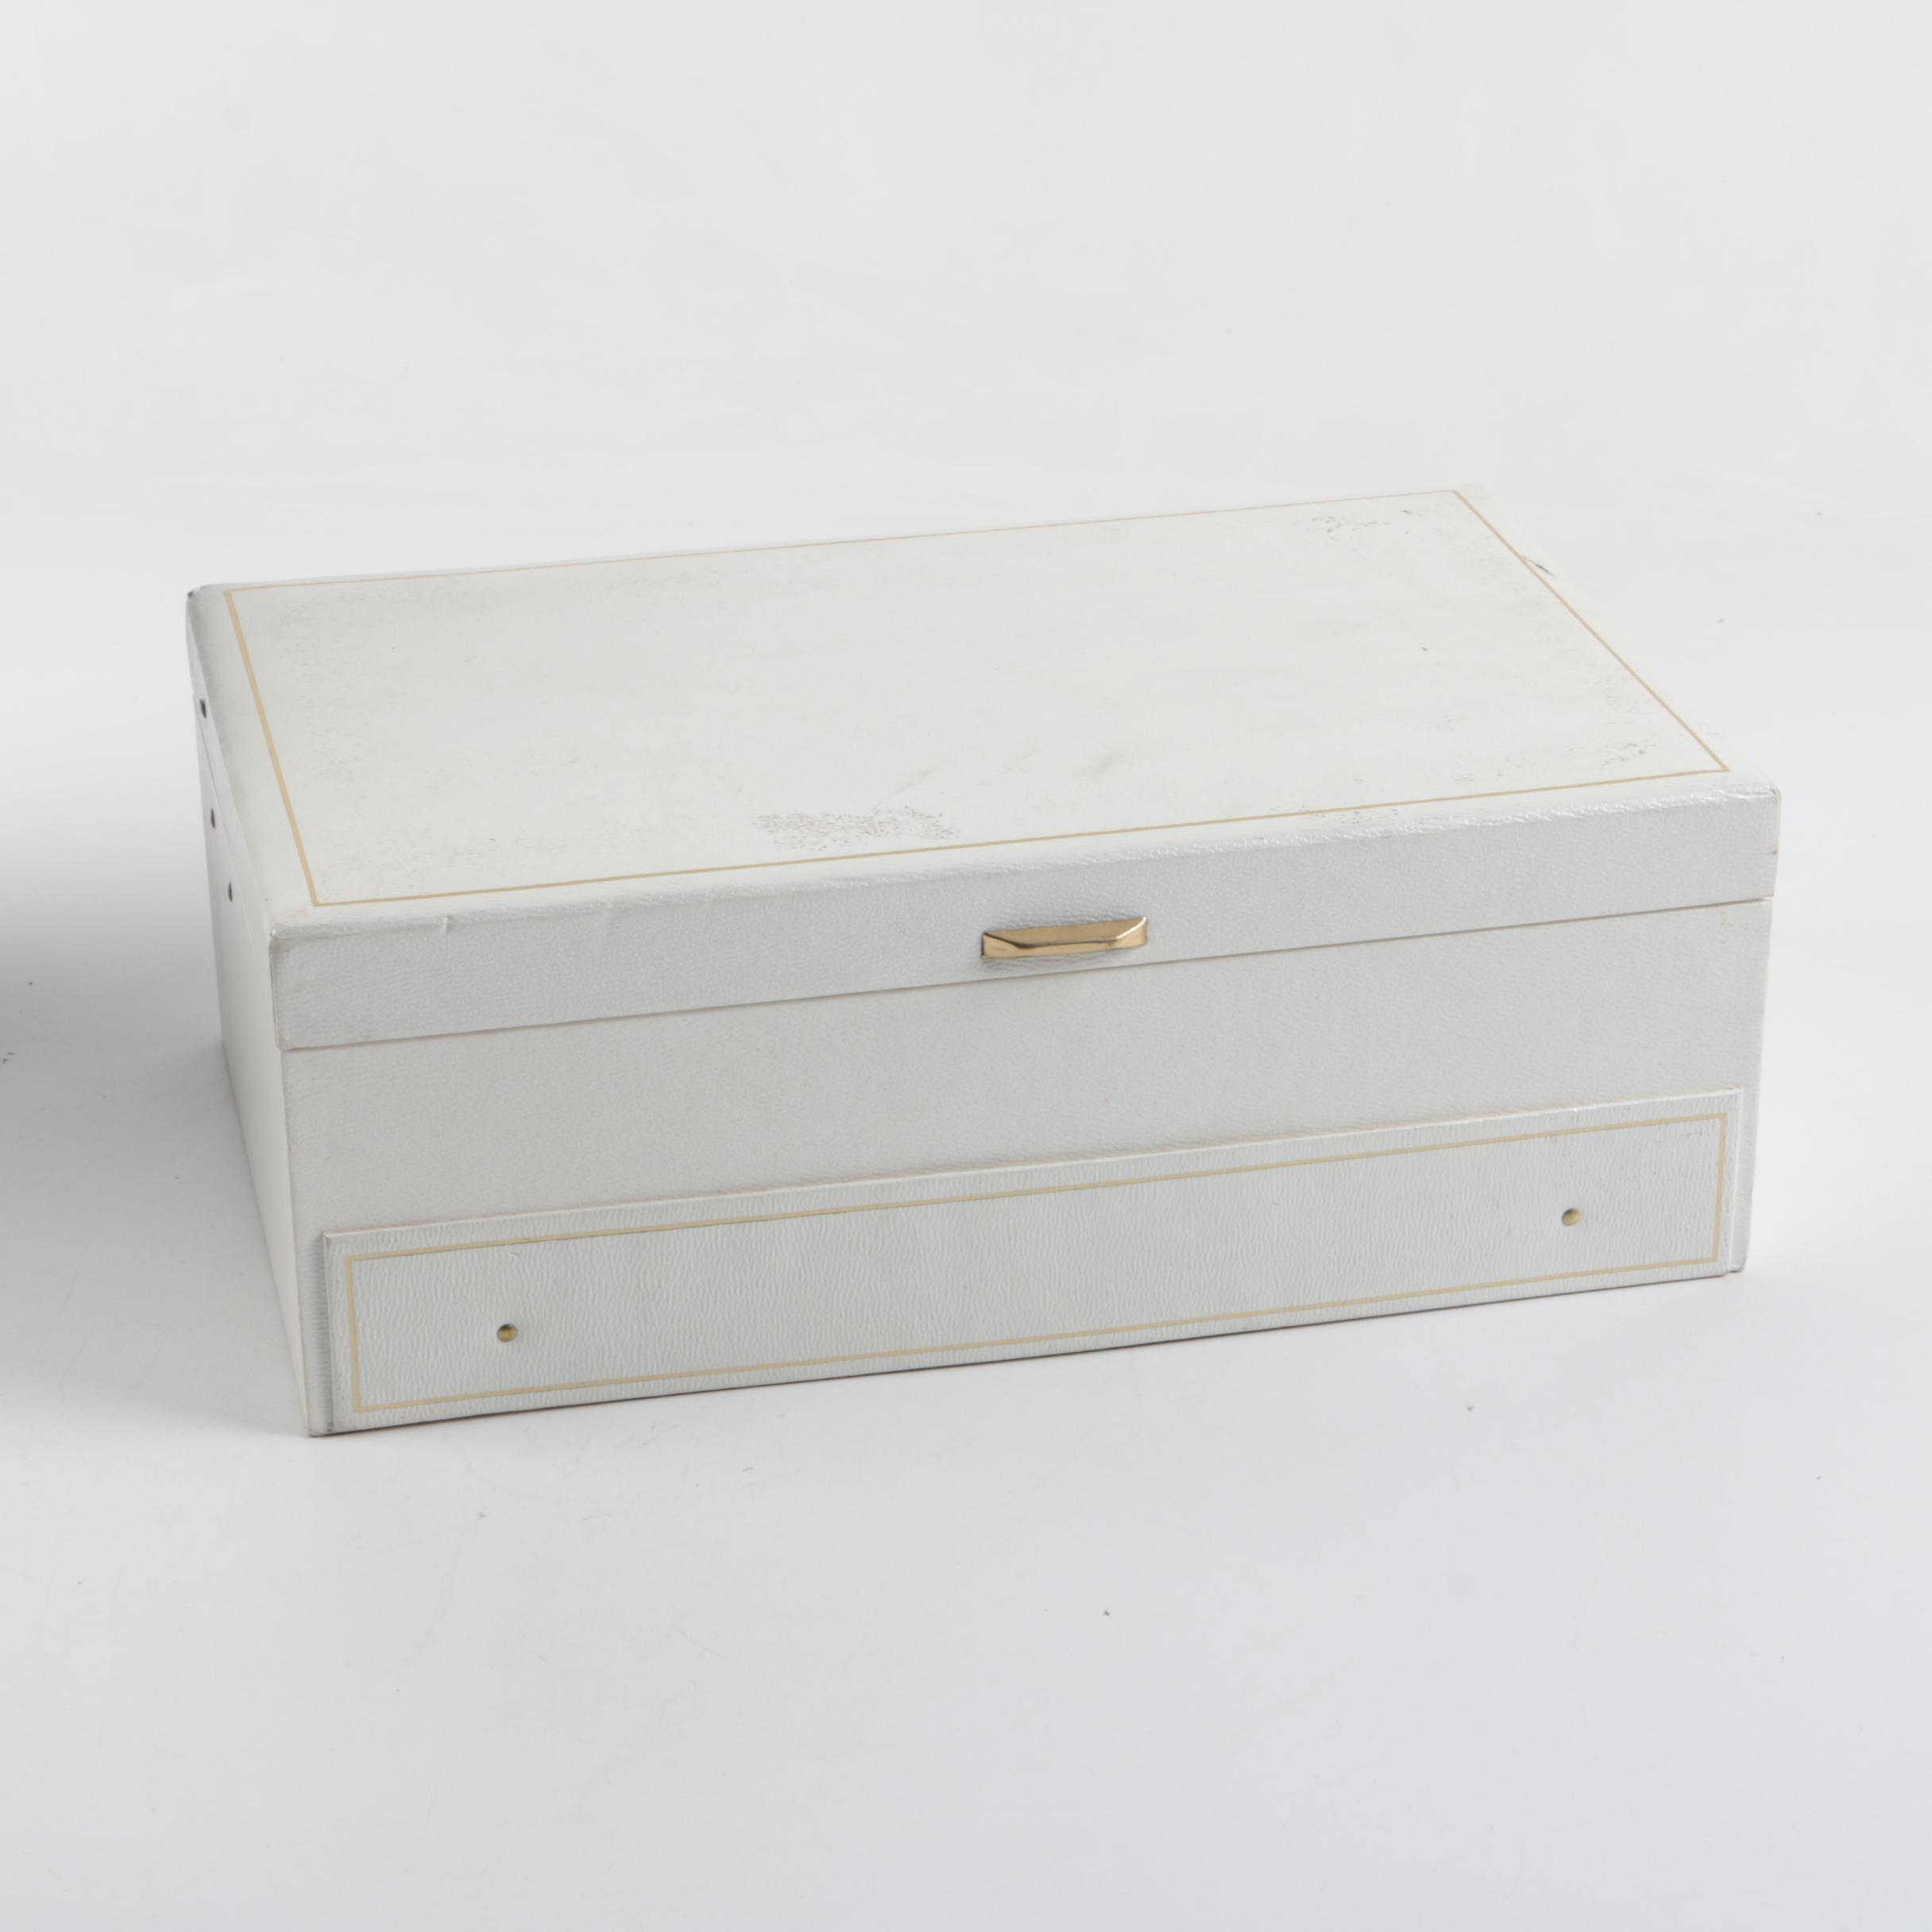 Mele Jewelry Box